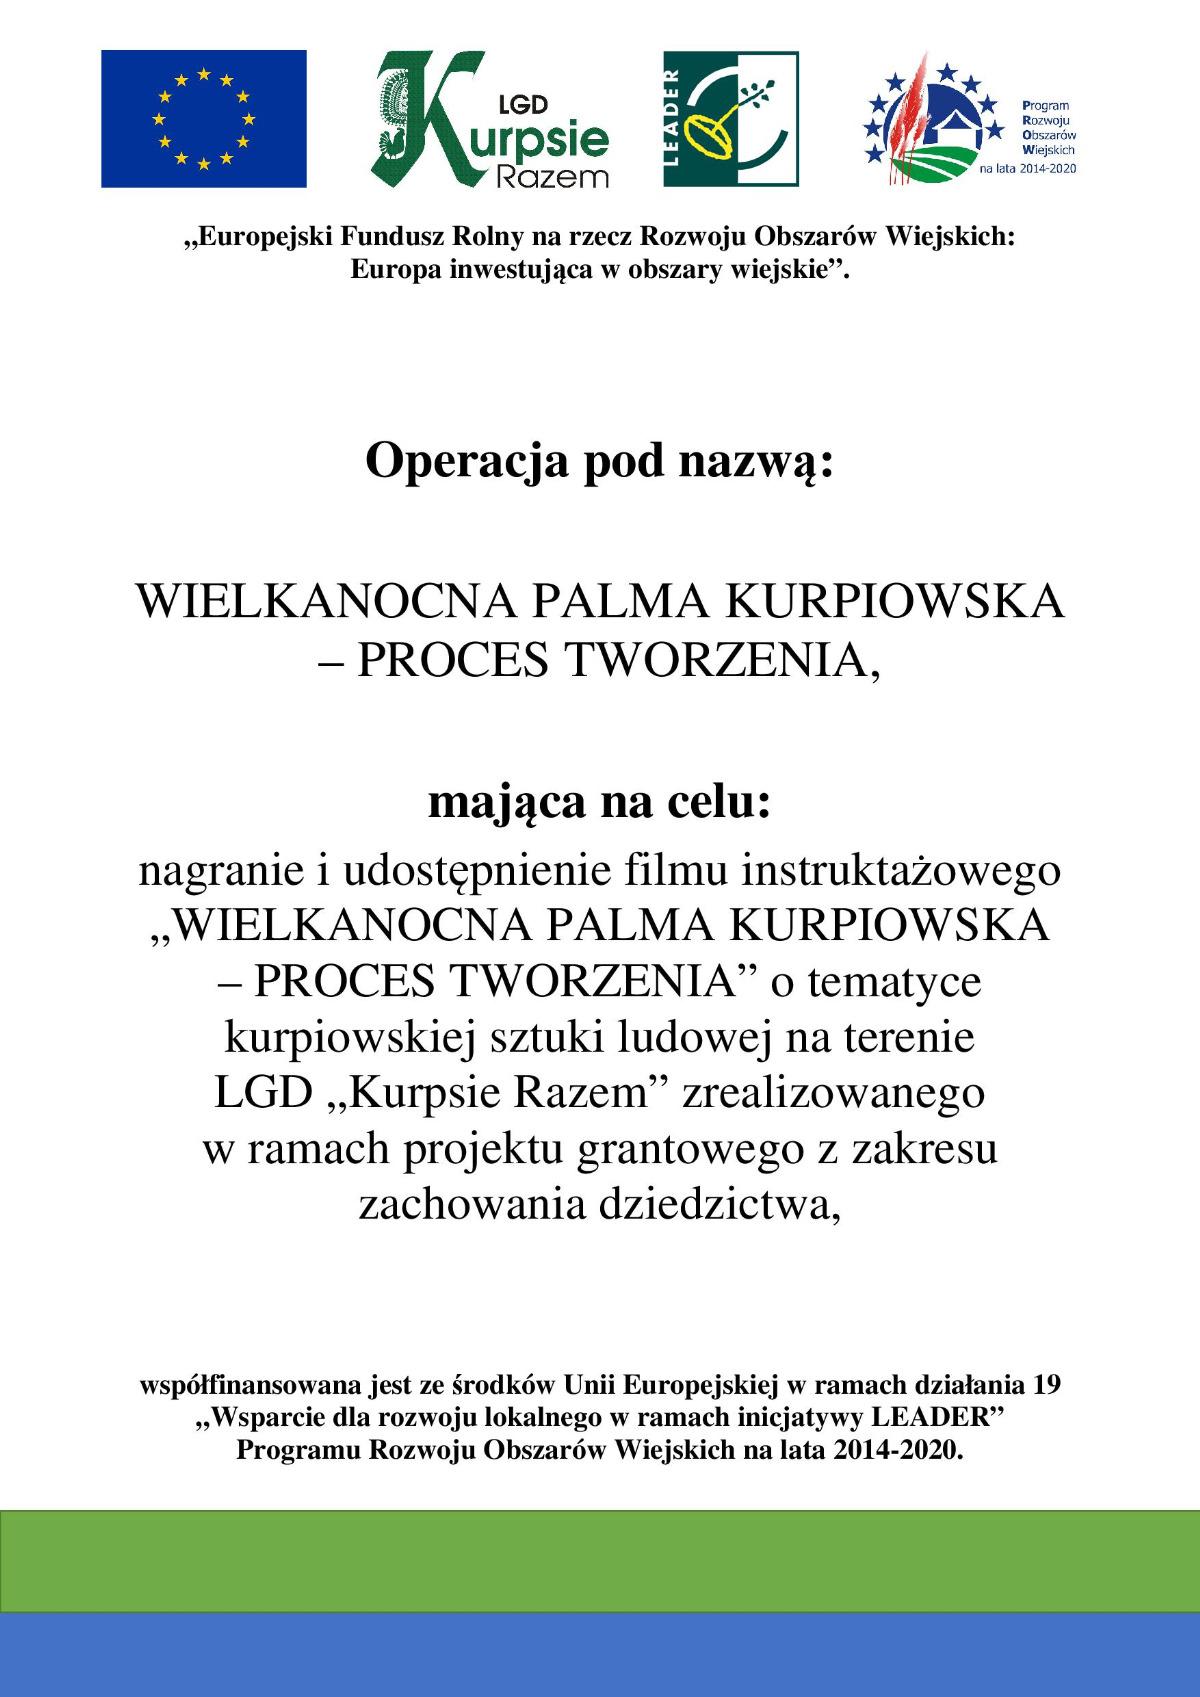 WIELKANOCNA PALMA KURPIOWSKA - PROCES TWORZENIA